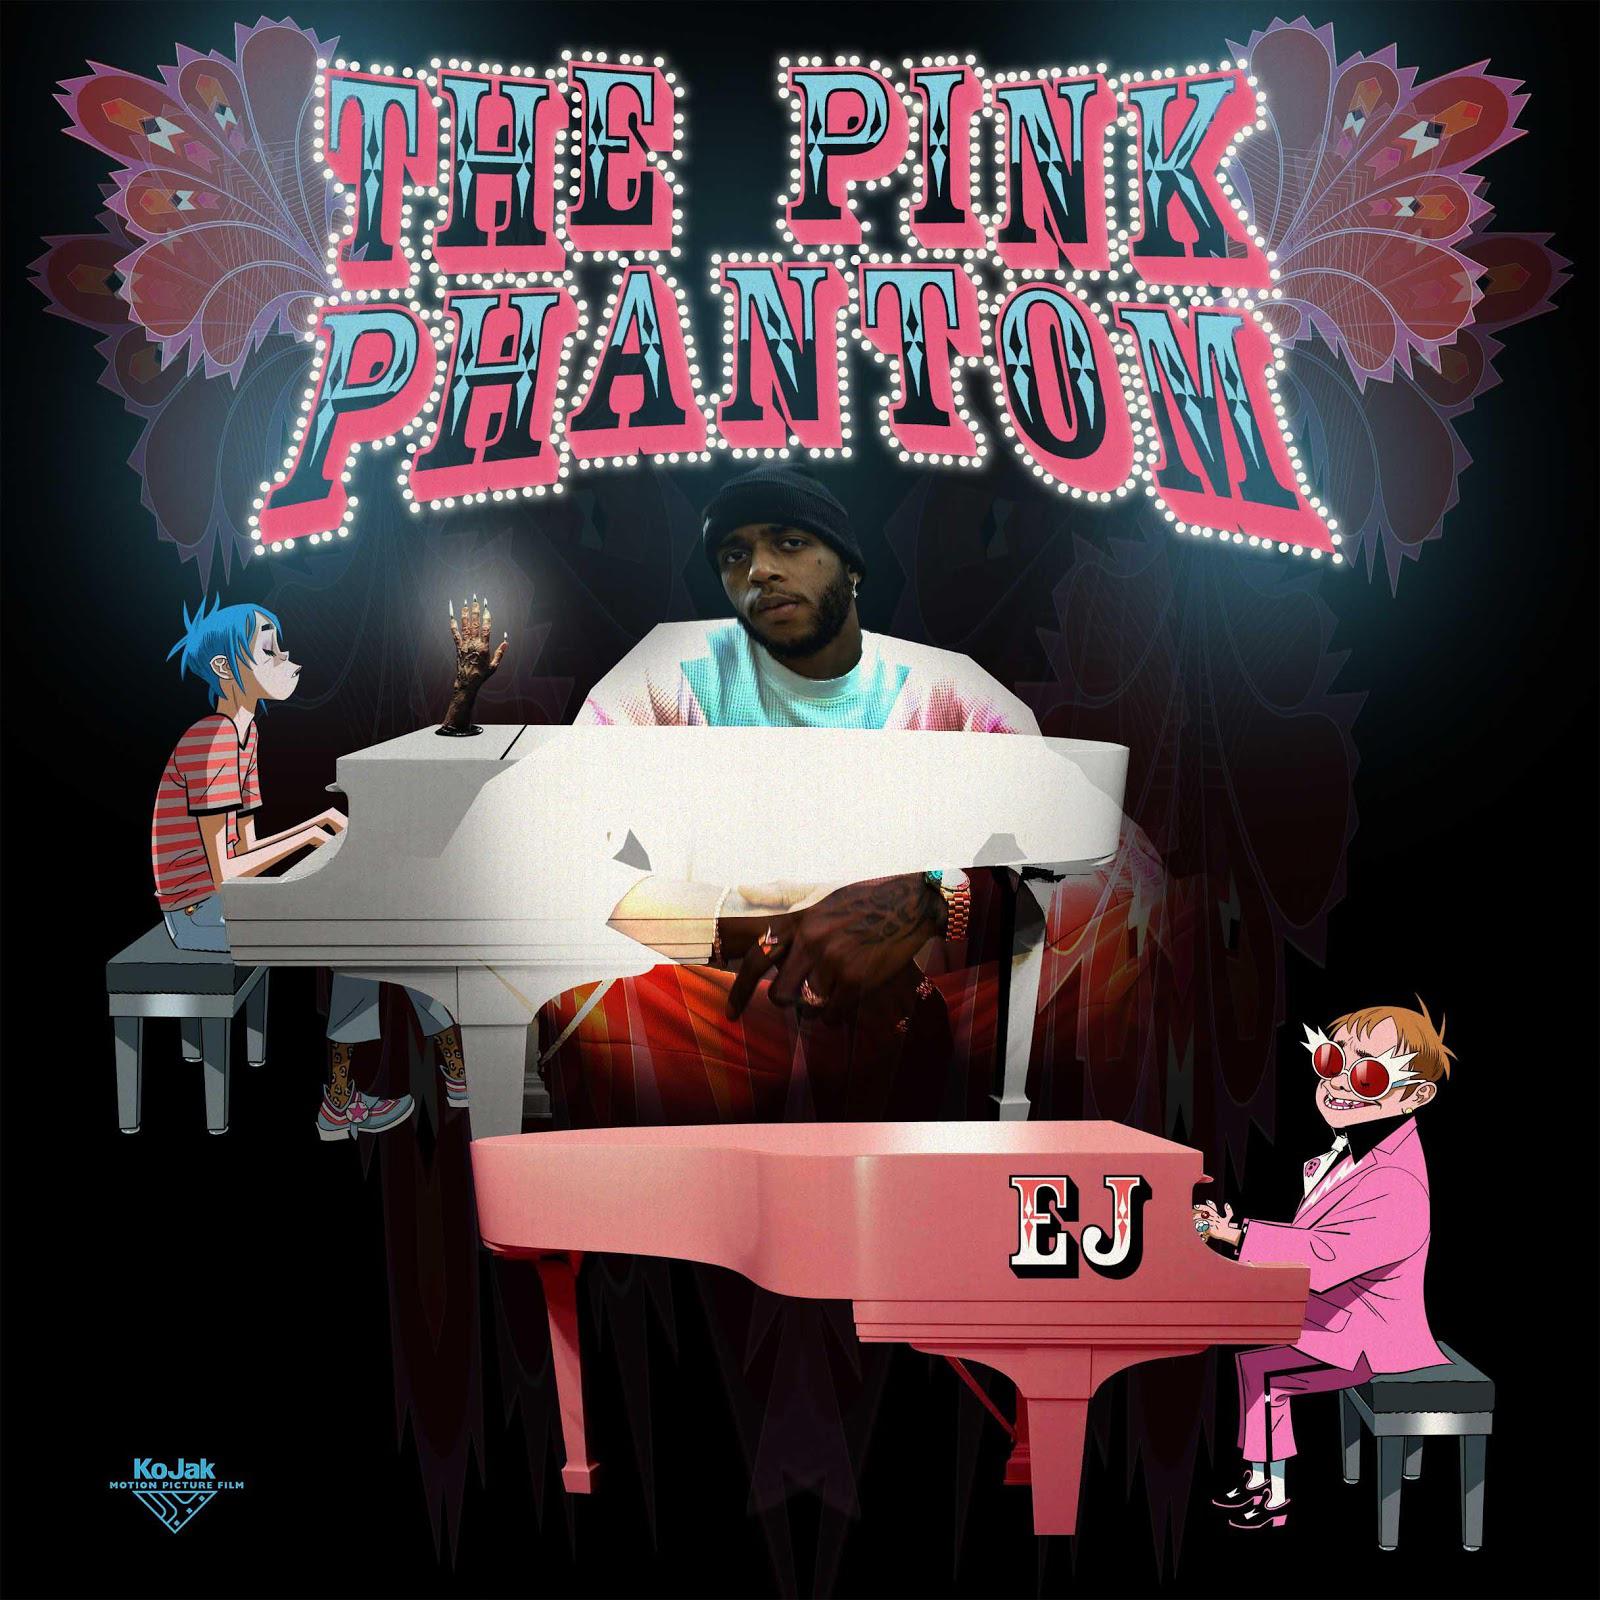 Elton John & 6LACK join GORILLAZ for 'The Pink Phantom' - Watch Now!